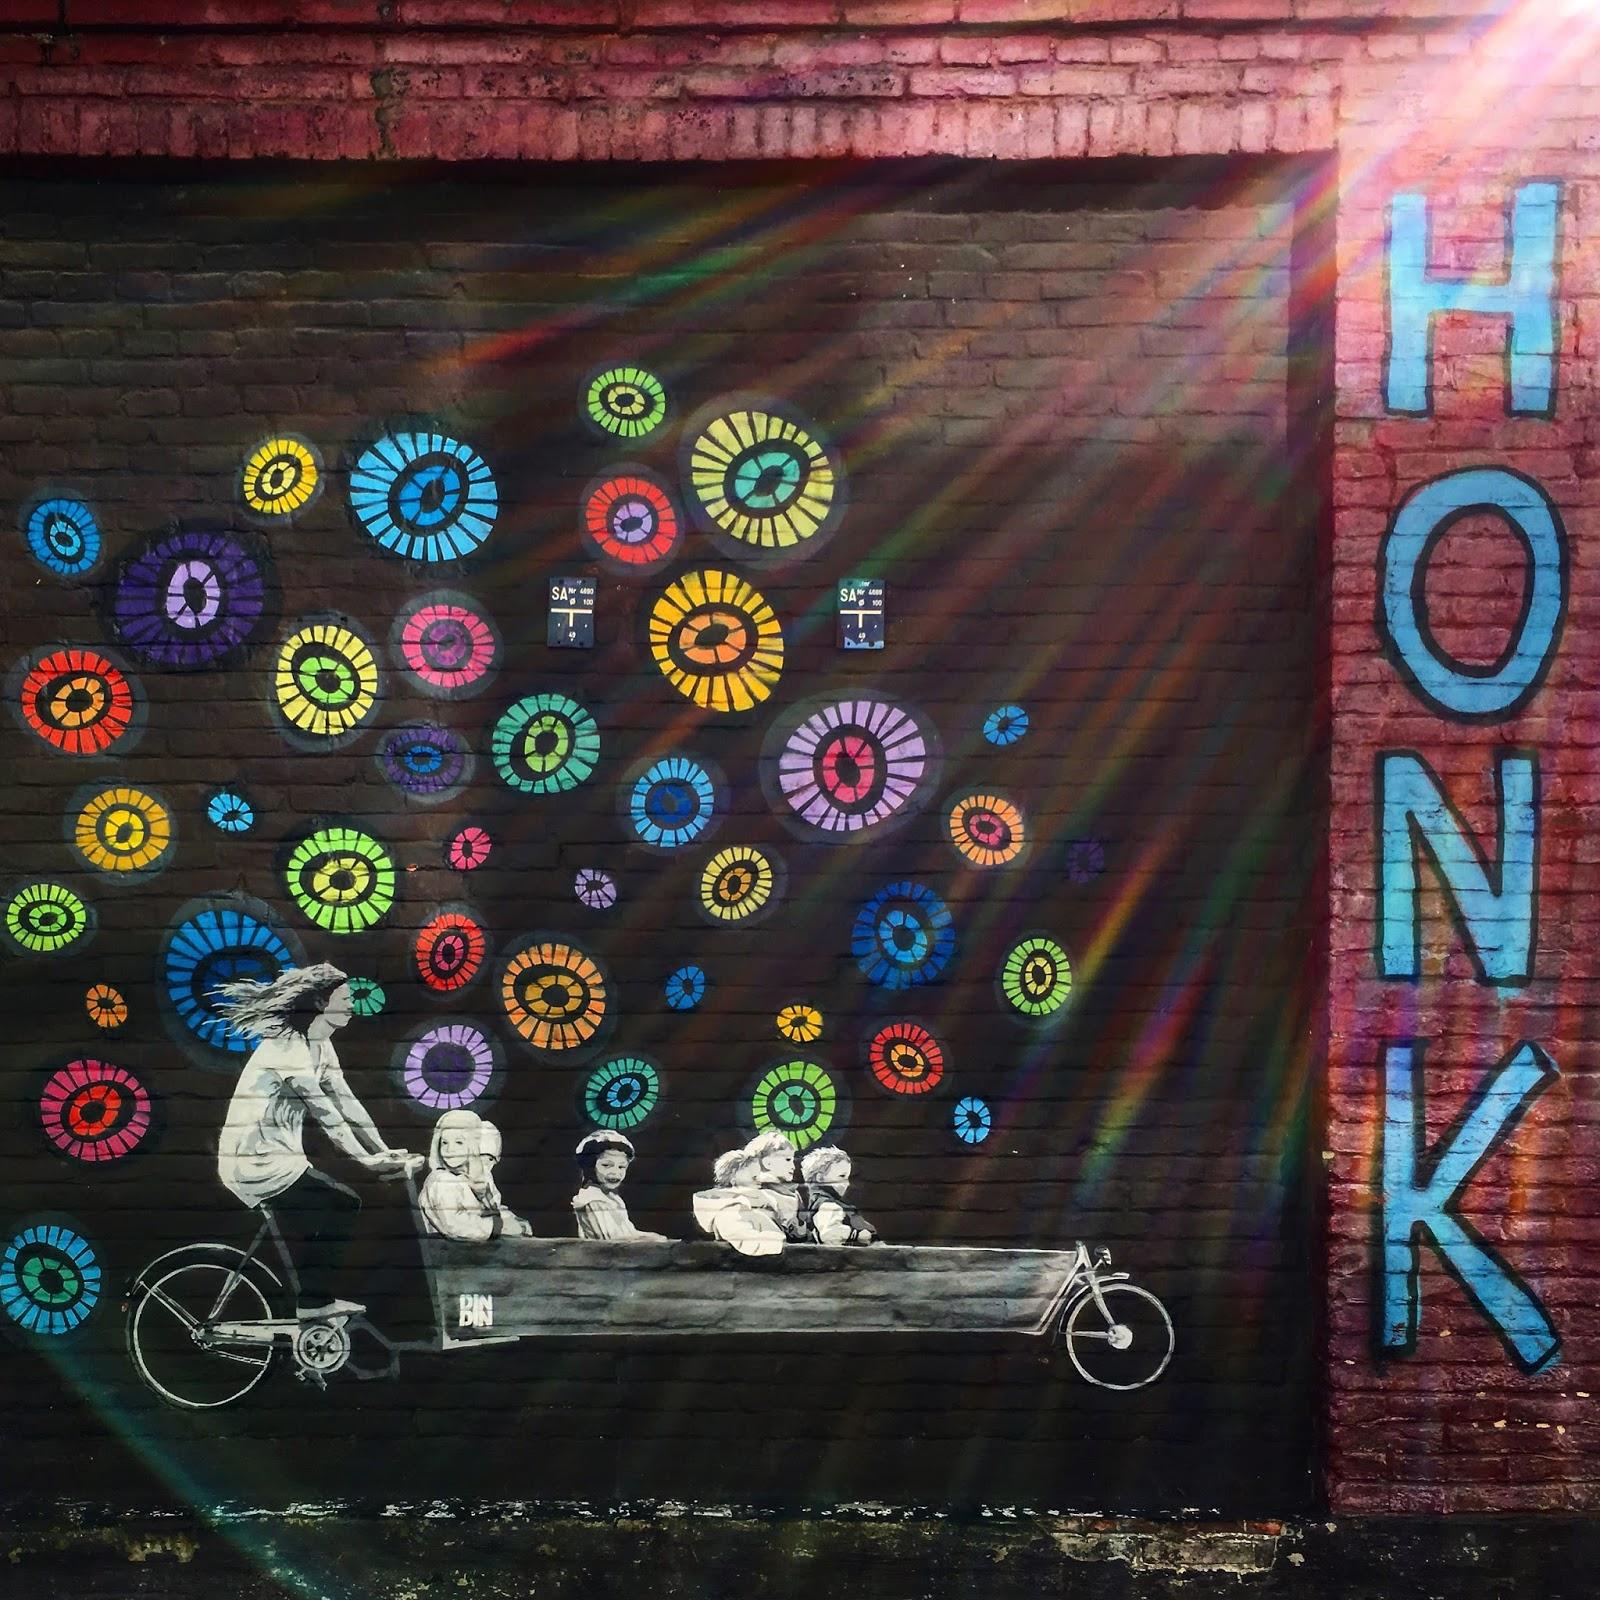 Le Chameau Bleu - Blog Voyage Gand Belgique - DinDin - Artiste de Street Art à Gand en Belgique